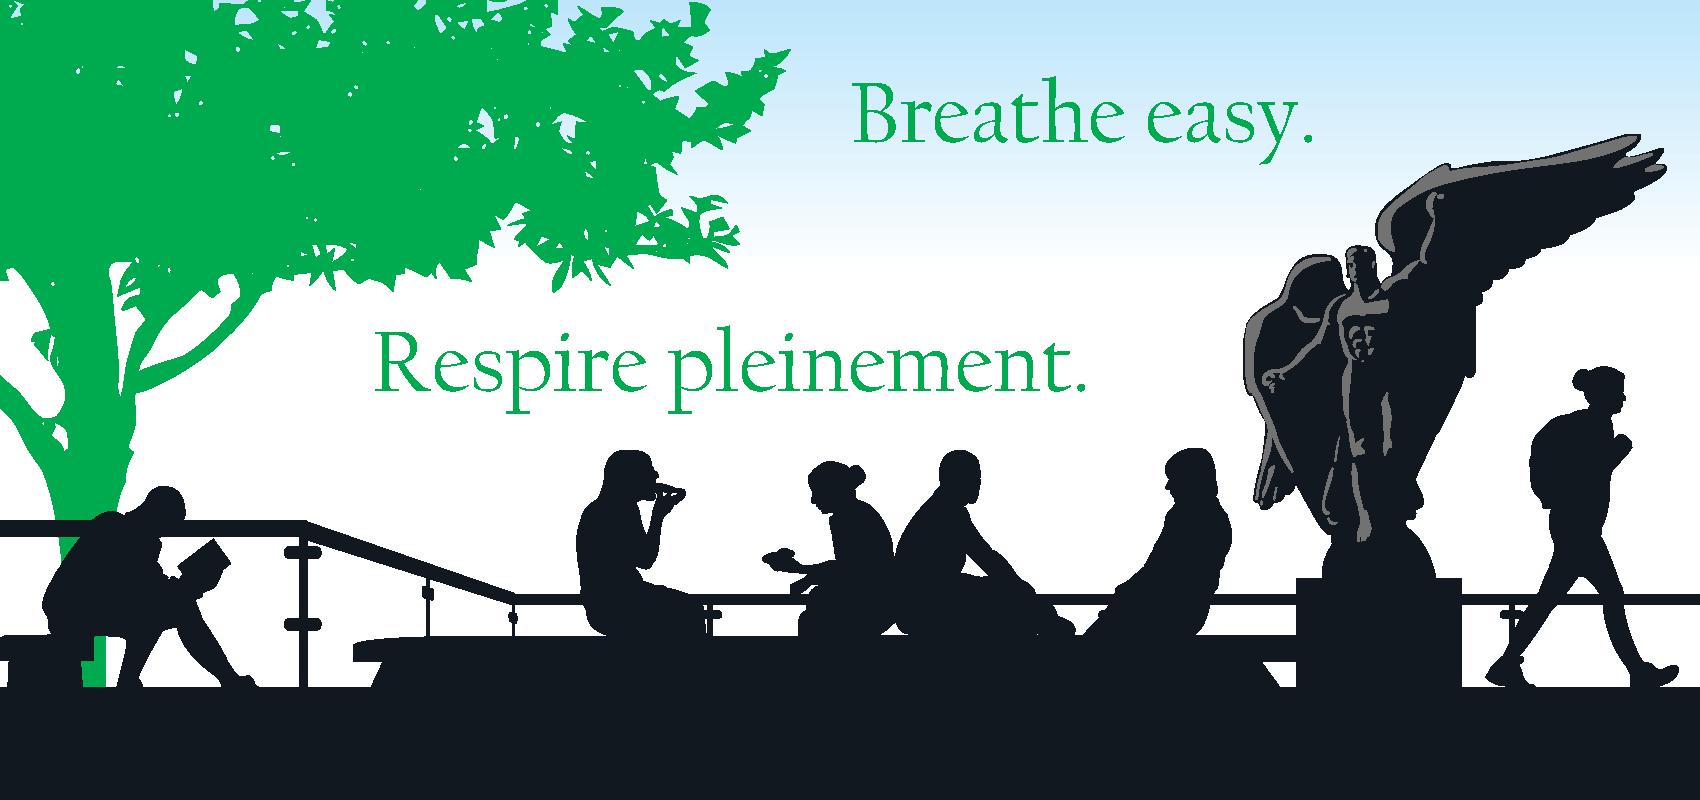 Breathe easy. Respire pleinement campaign image.